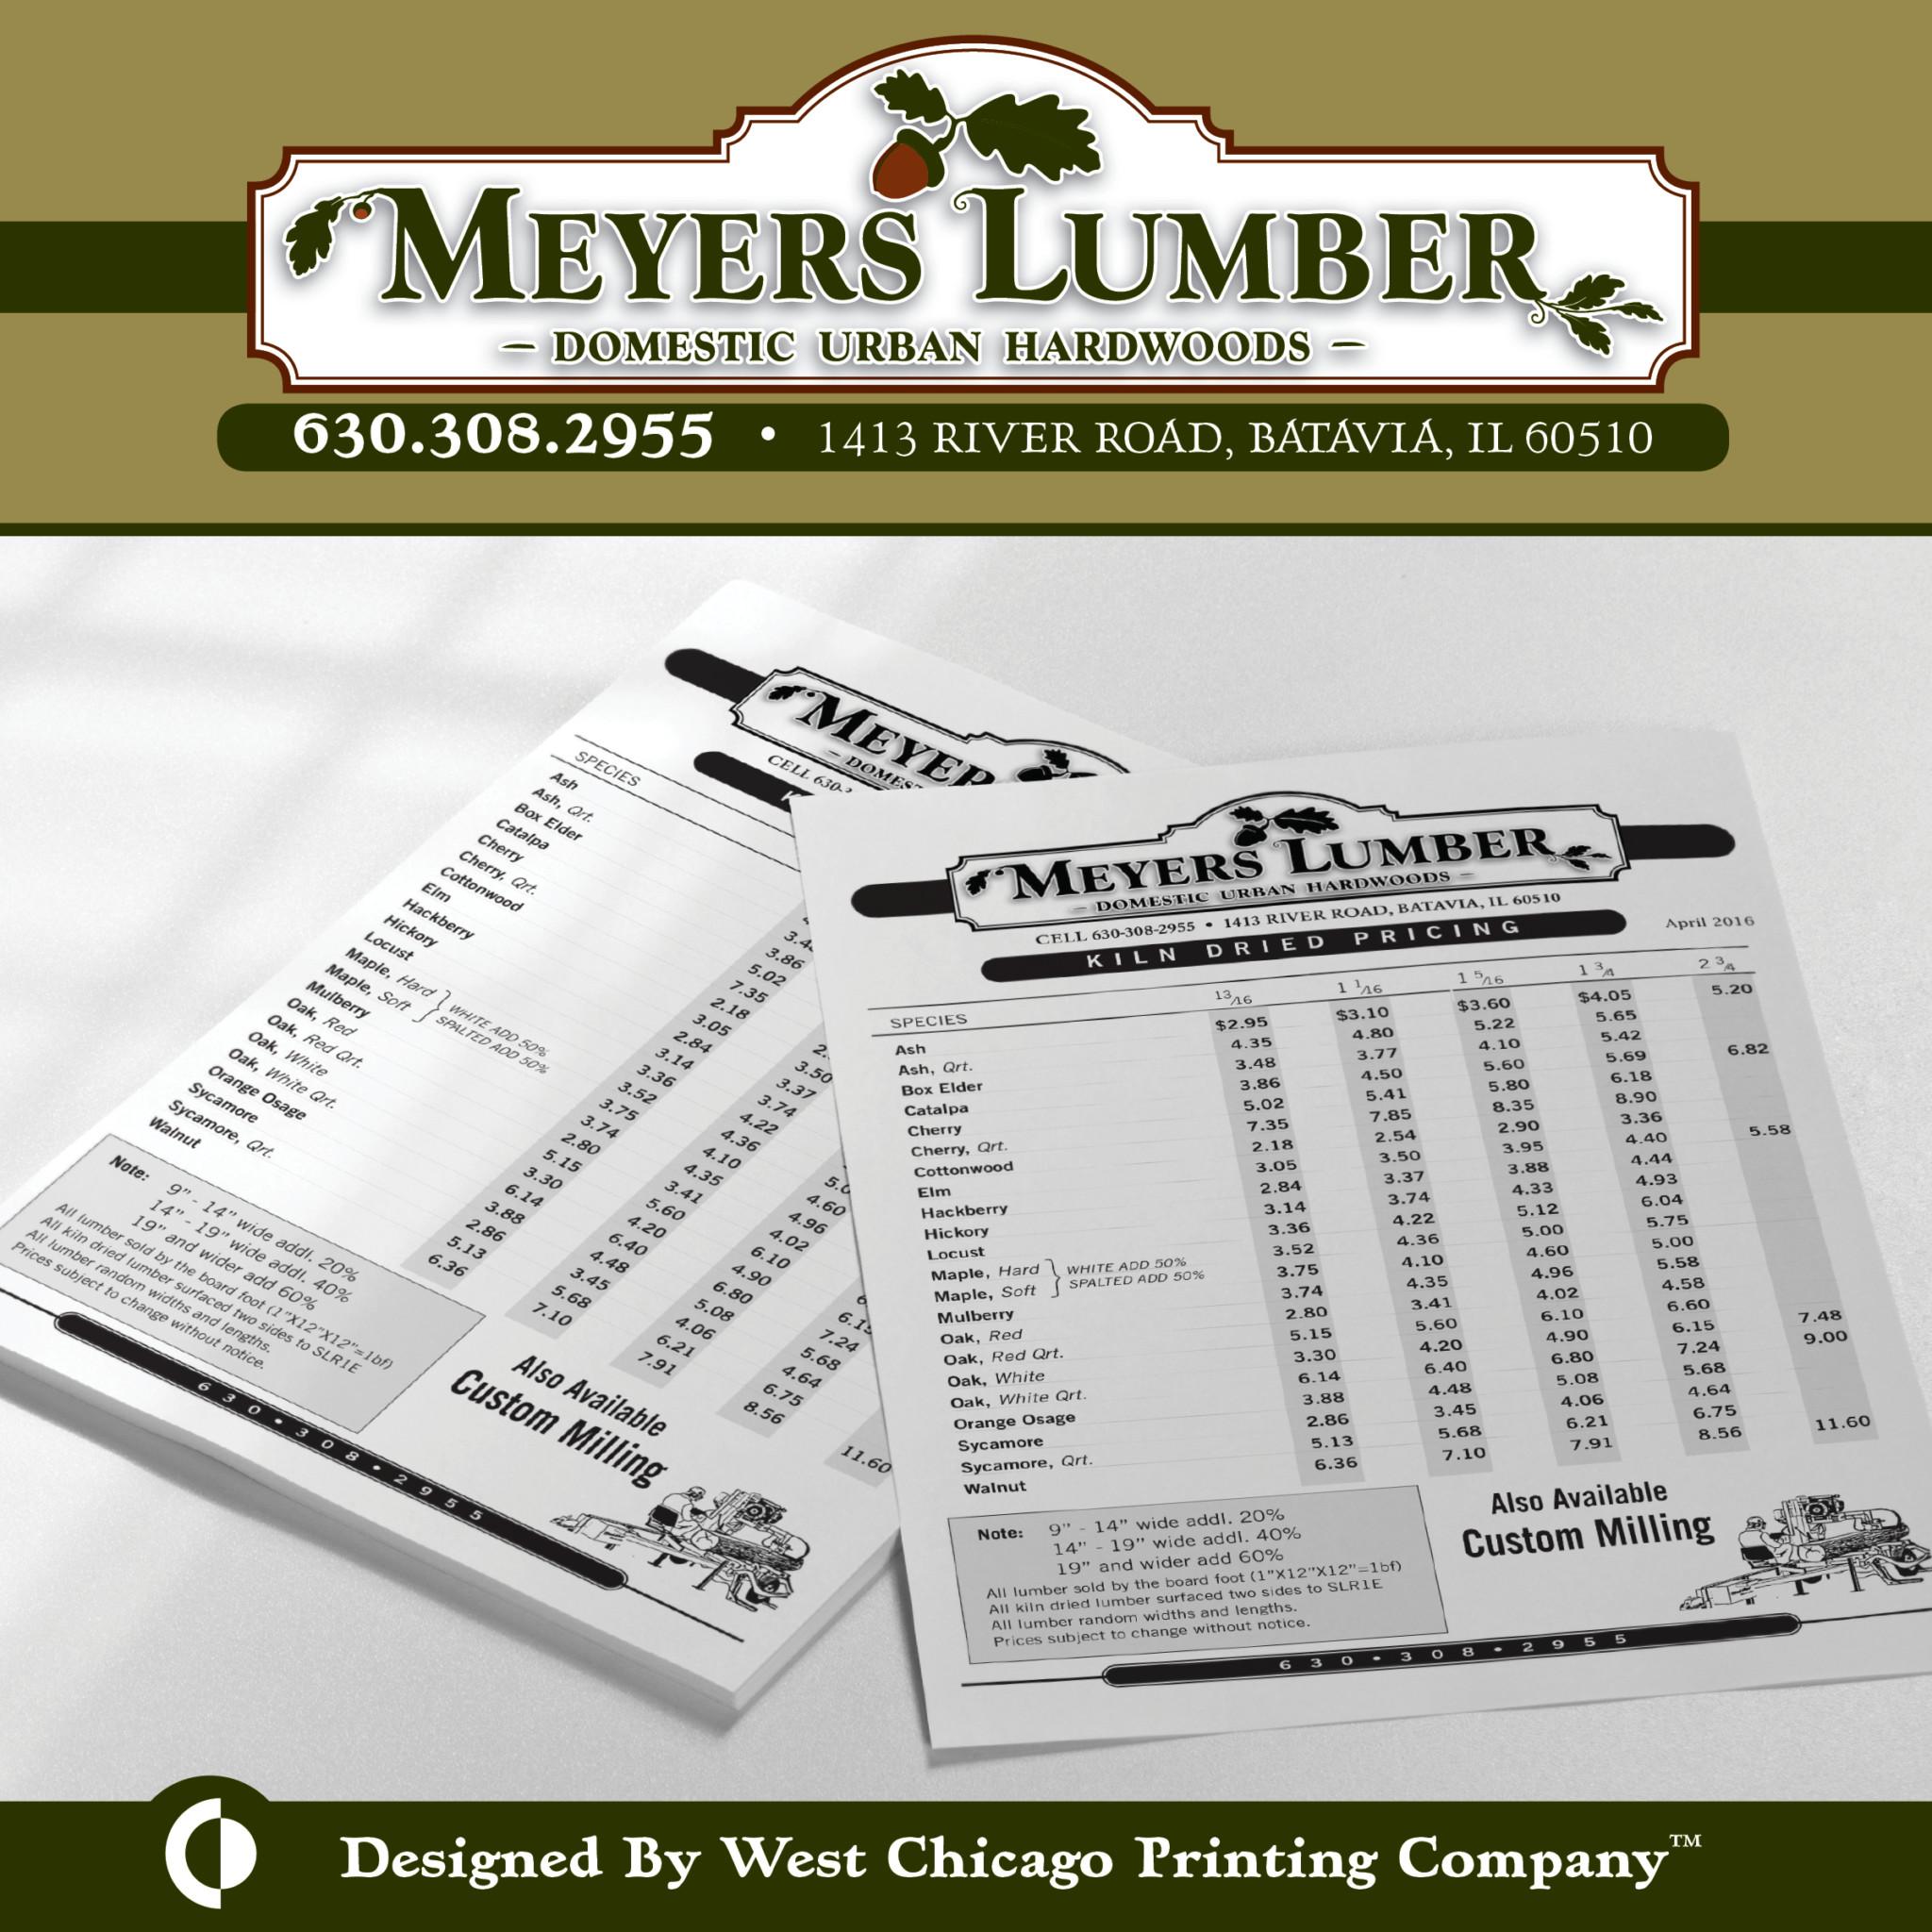 Meyers Lumber Branding